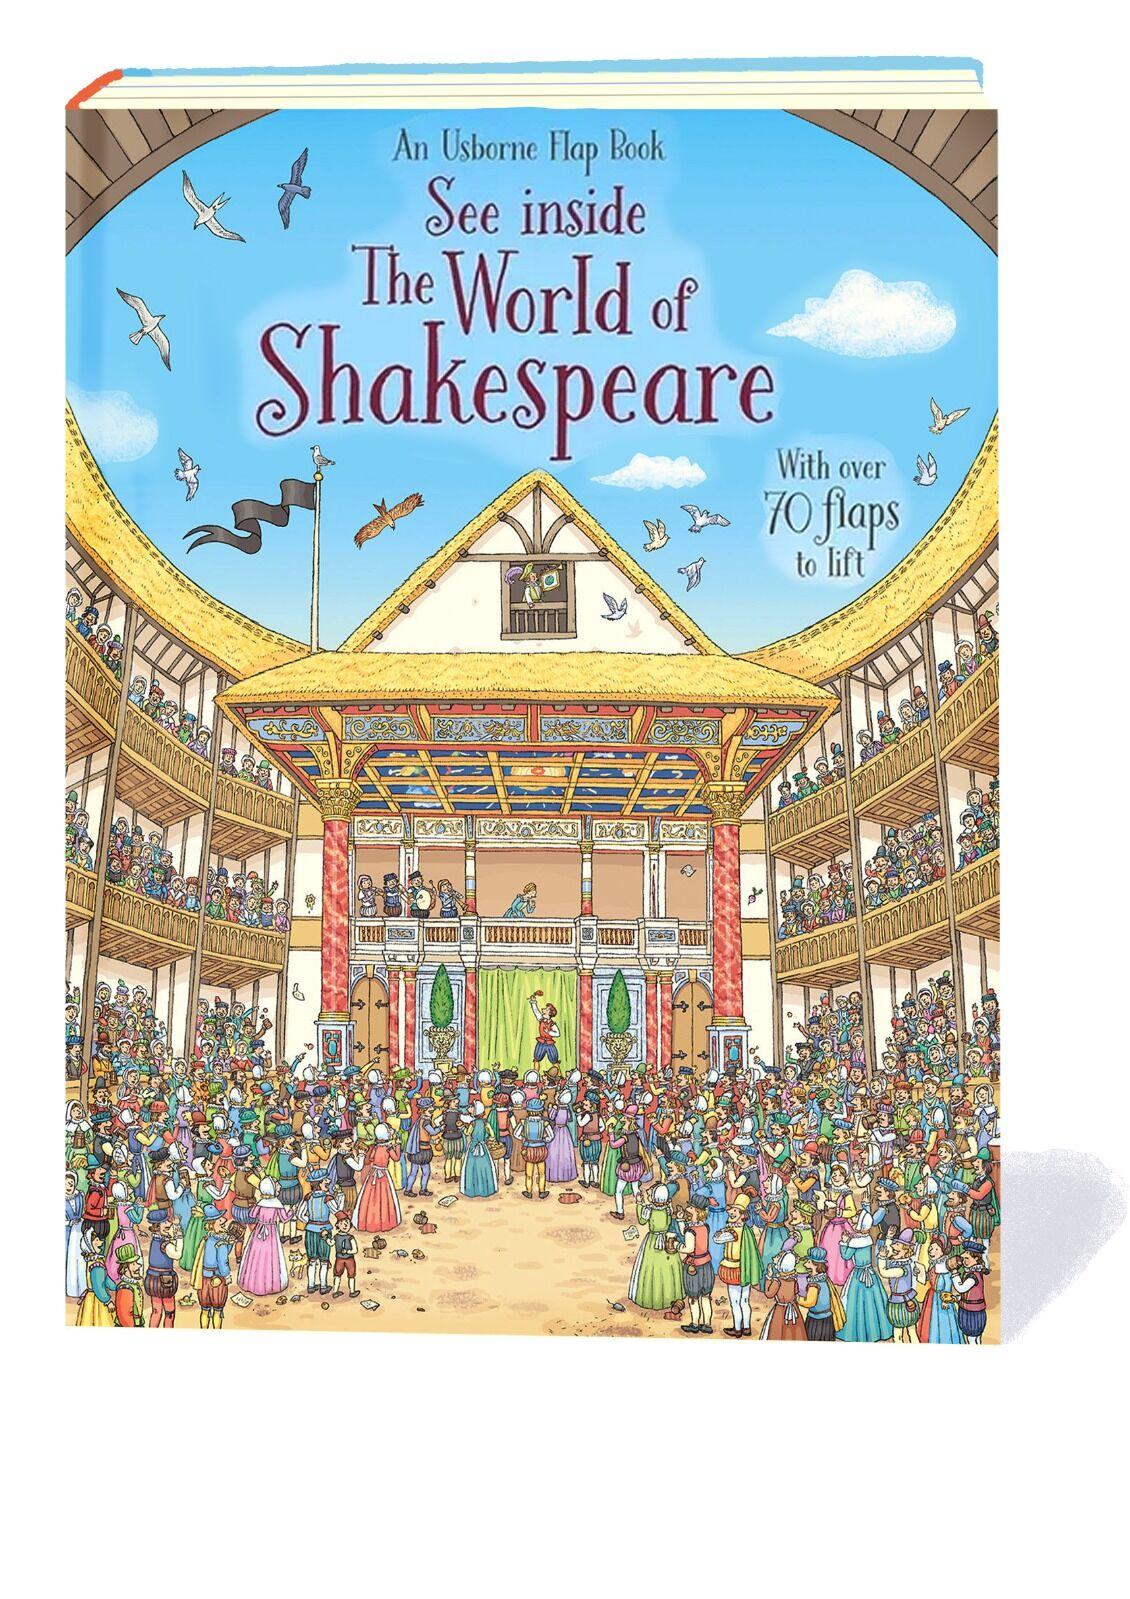 See Inside The World of Shakespeare. © Usborne Publishing.